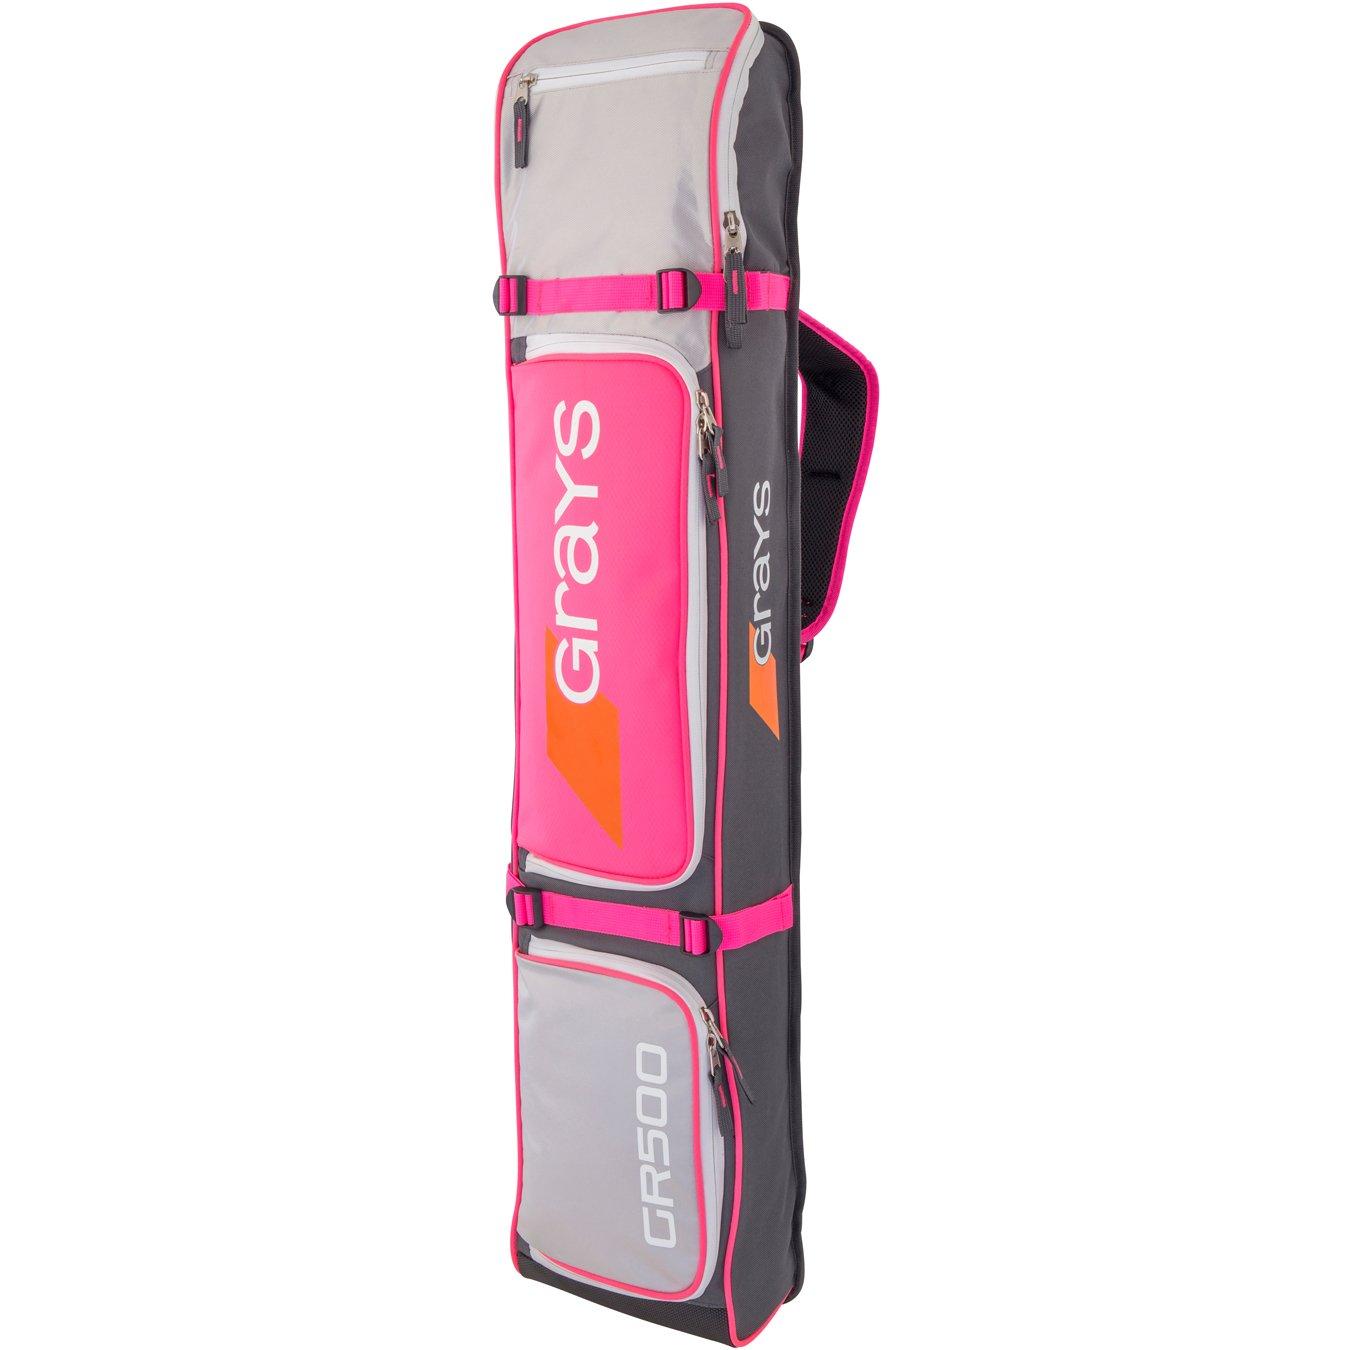 Grays Gr500 Stick Bag Grays Unisex GR500 Stick Bag Grey/Silver/Pink One Size 6603902